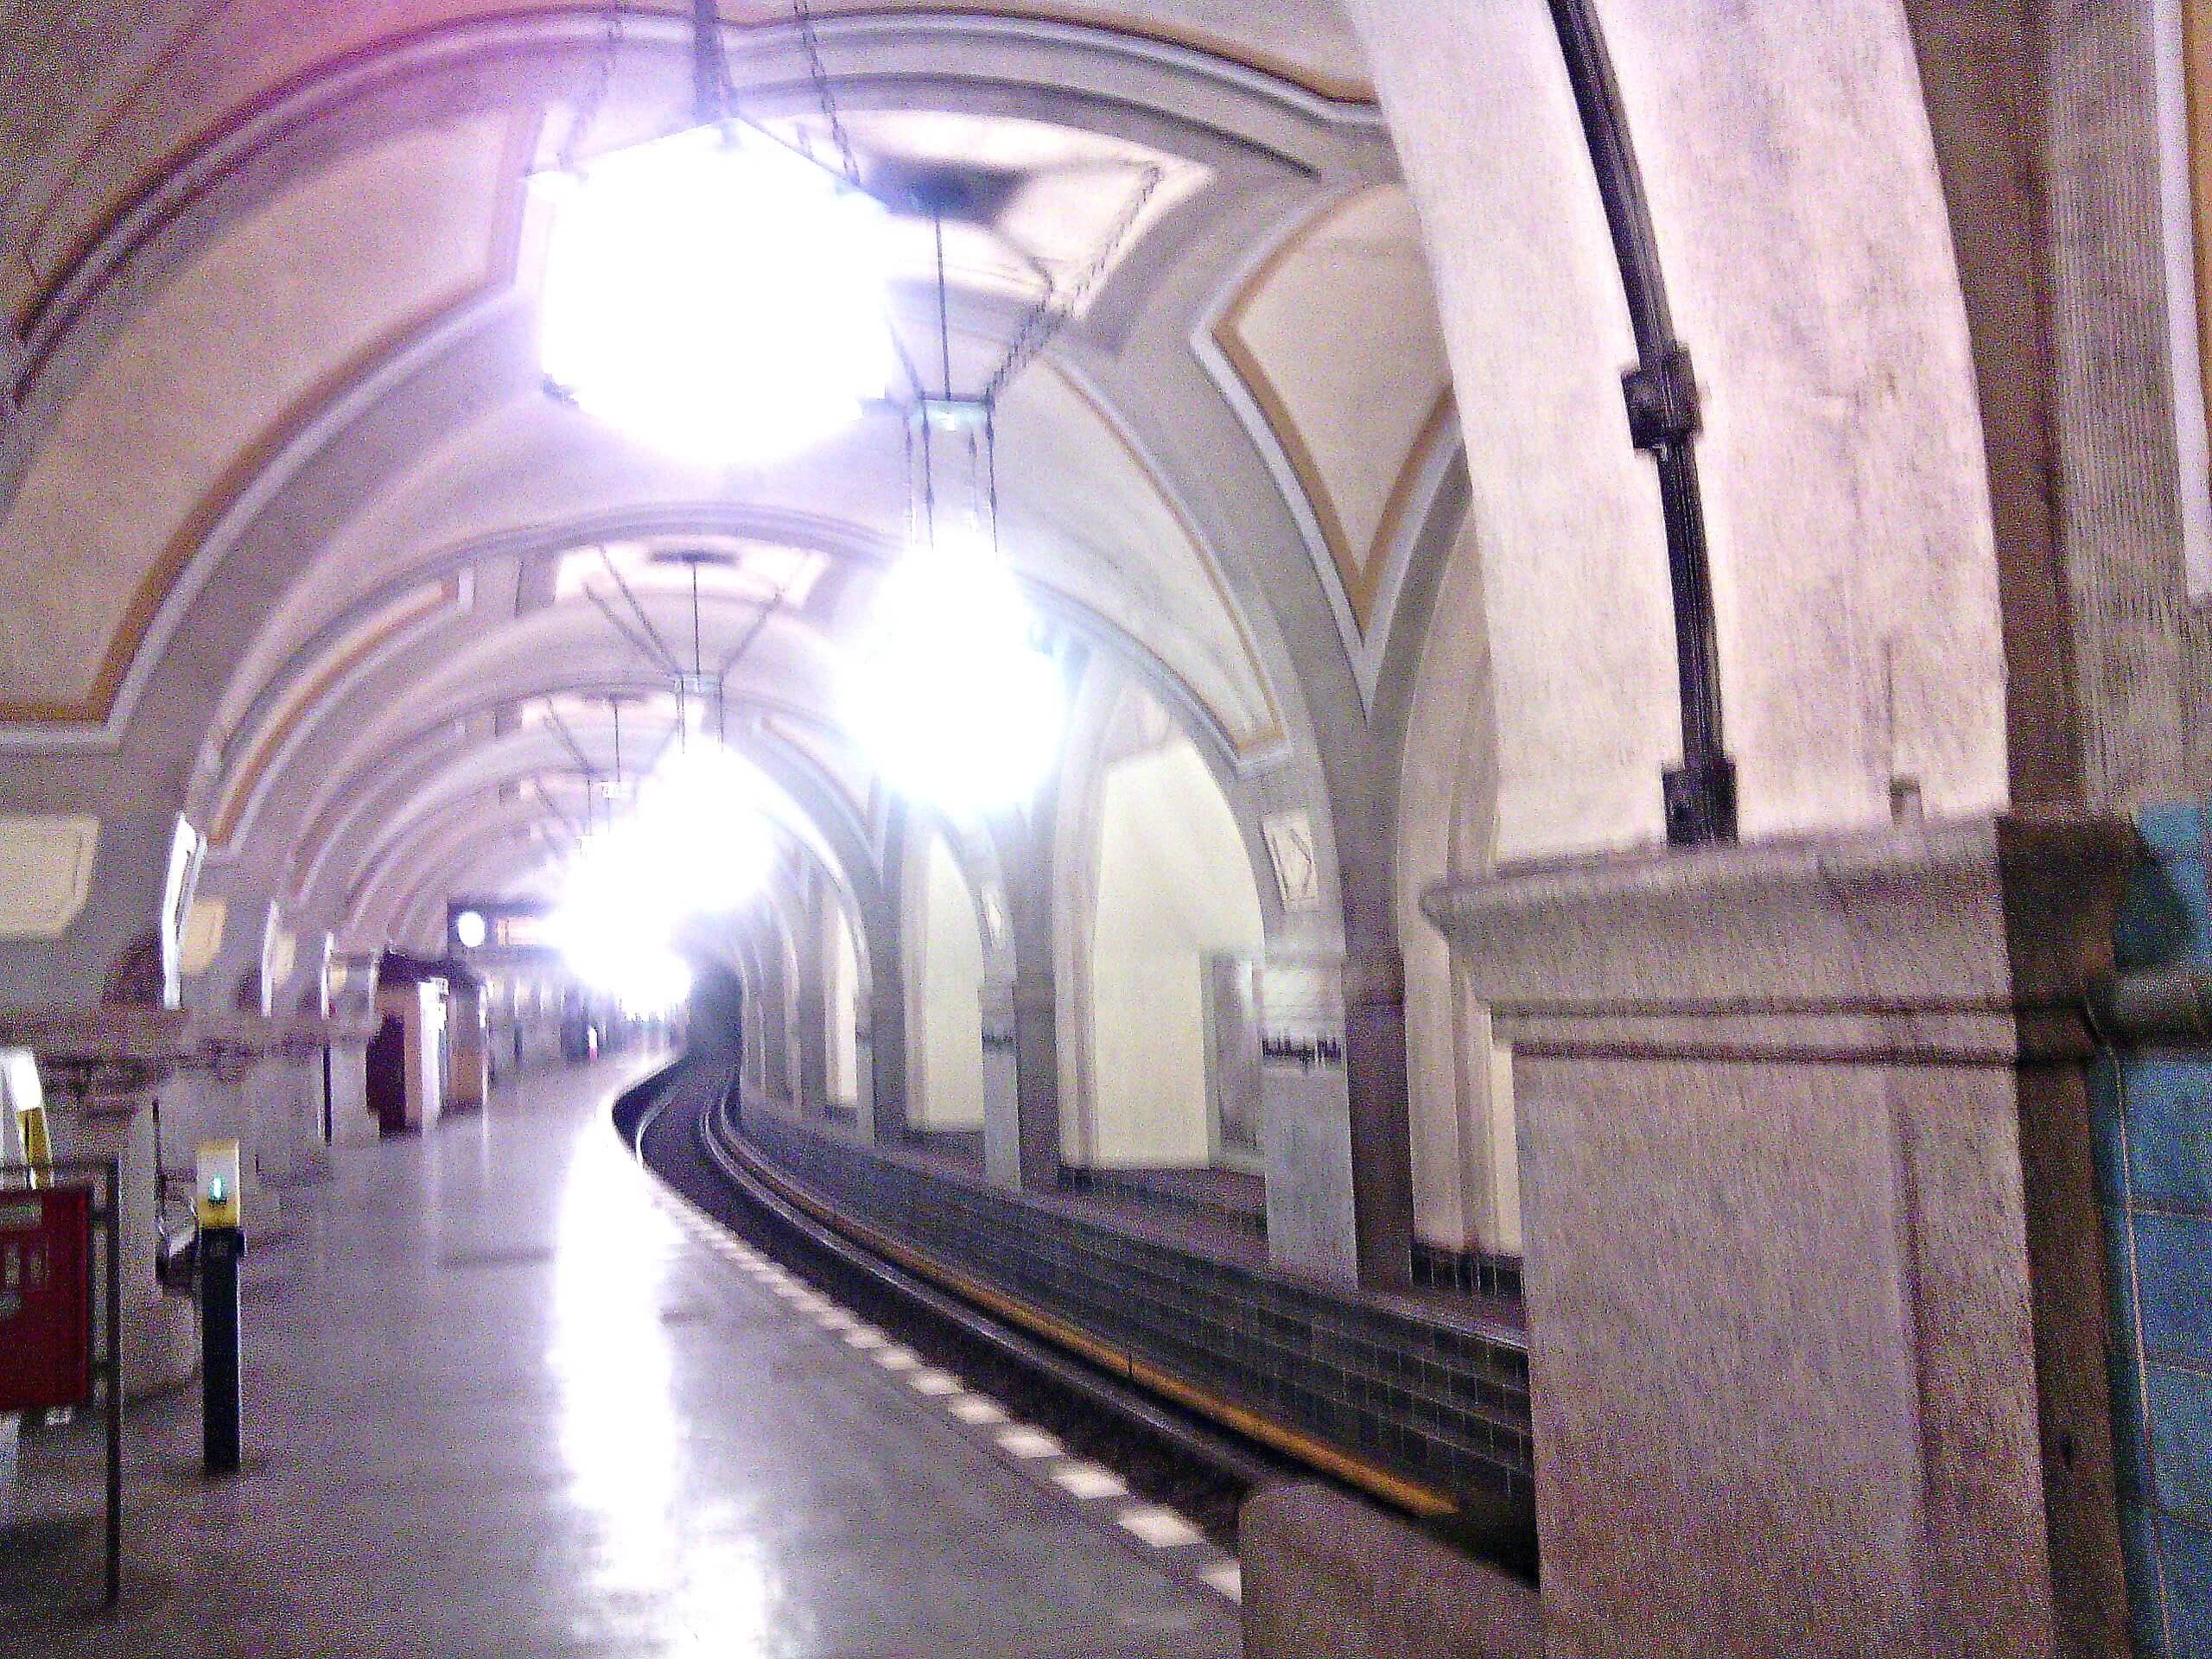 Perron U-Bahn station